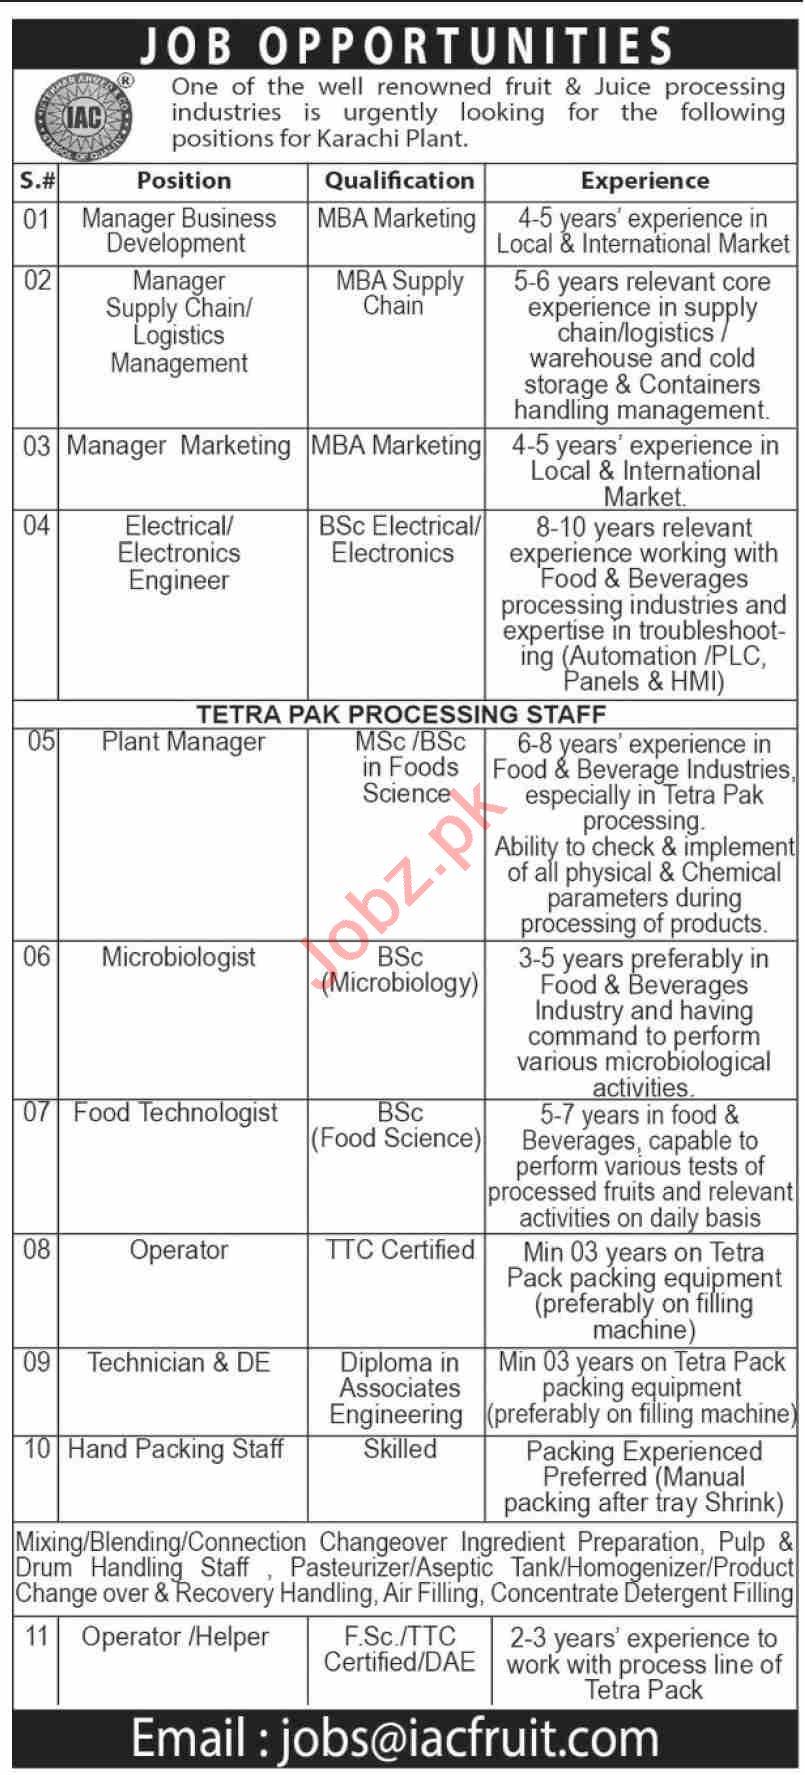 IAC Fruit Karachi Jobs 2020 for Manager & Engineer